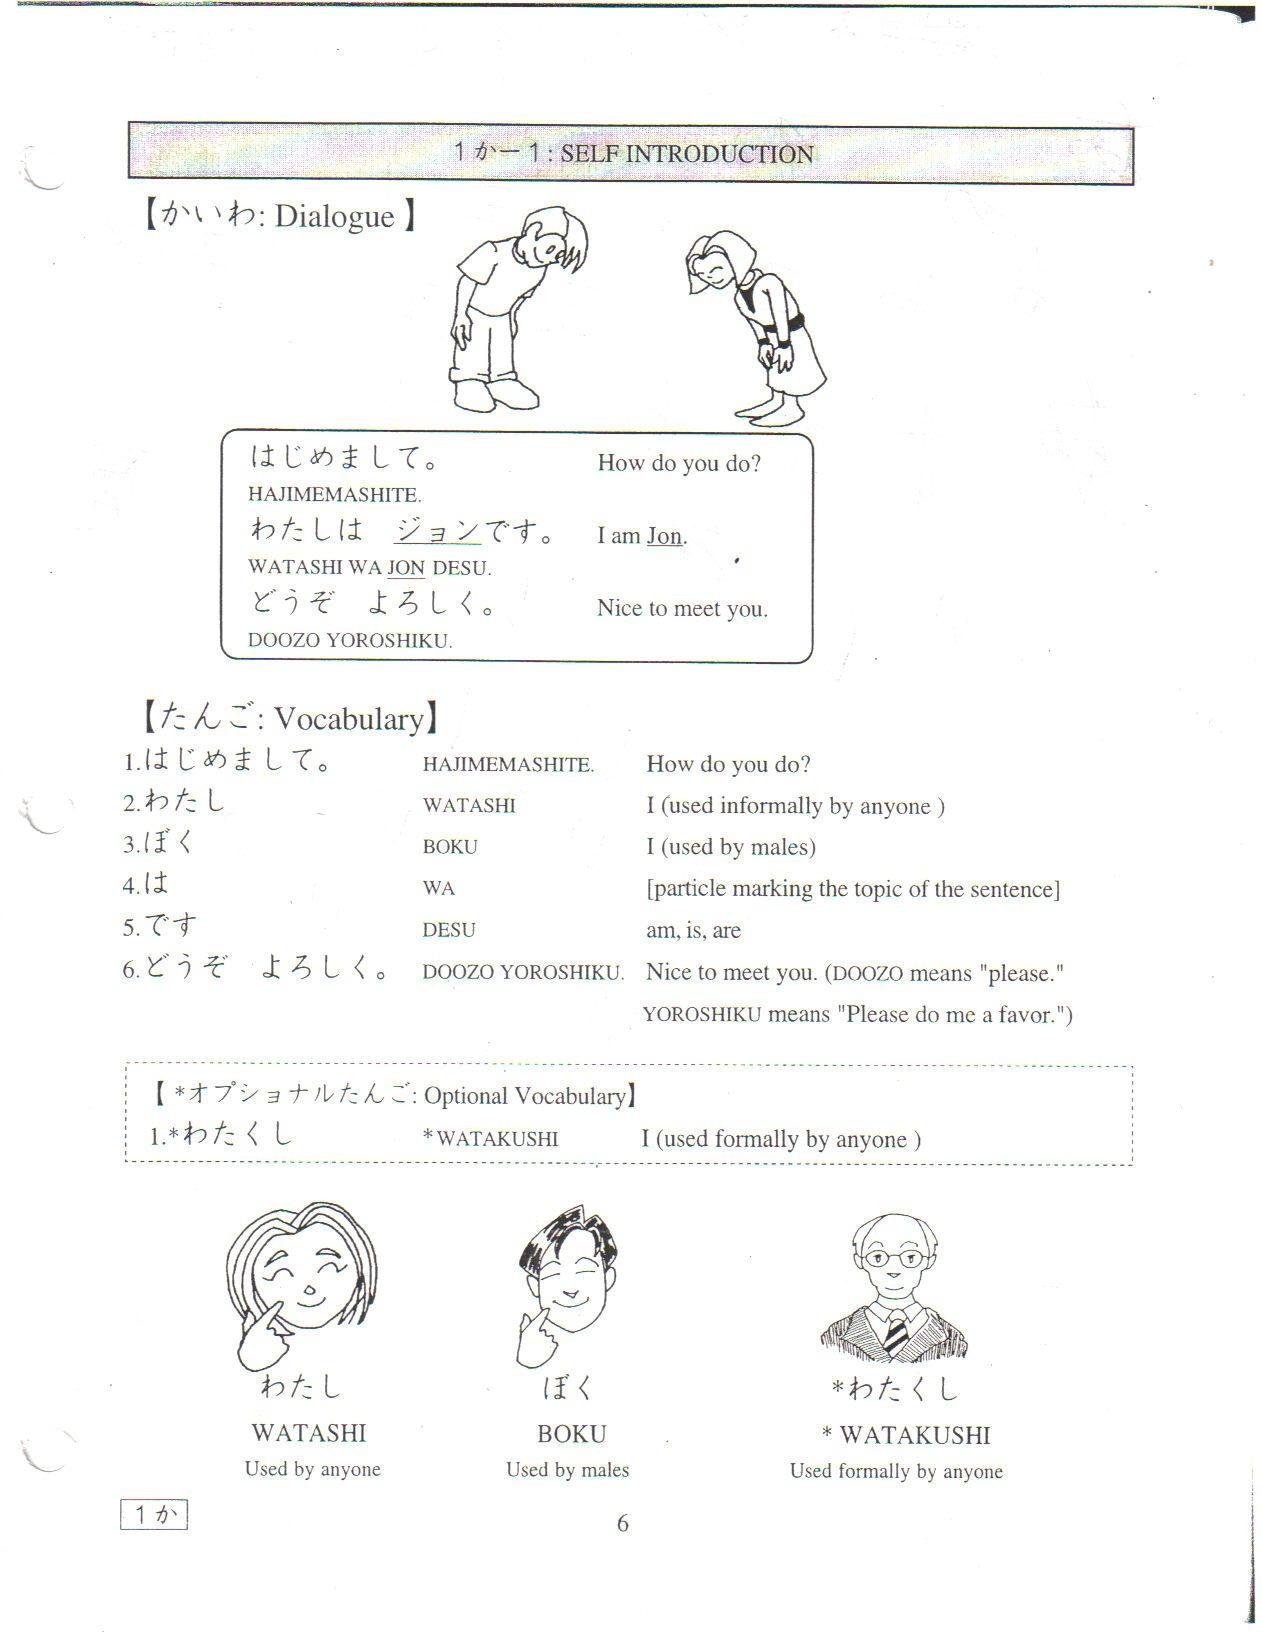 Self Introduction Japanese Worksheet   Learning Japanese   Japanese - Free Printable Japanese Language Worksheets